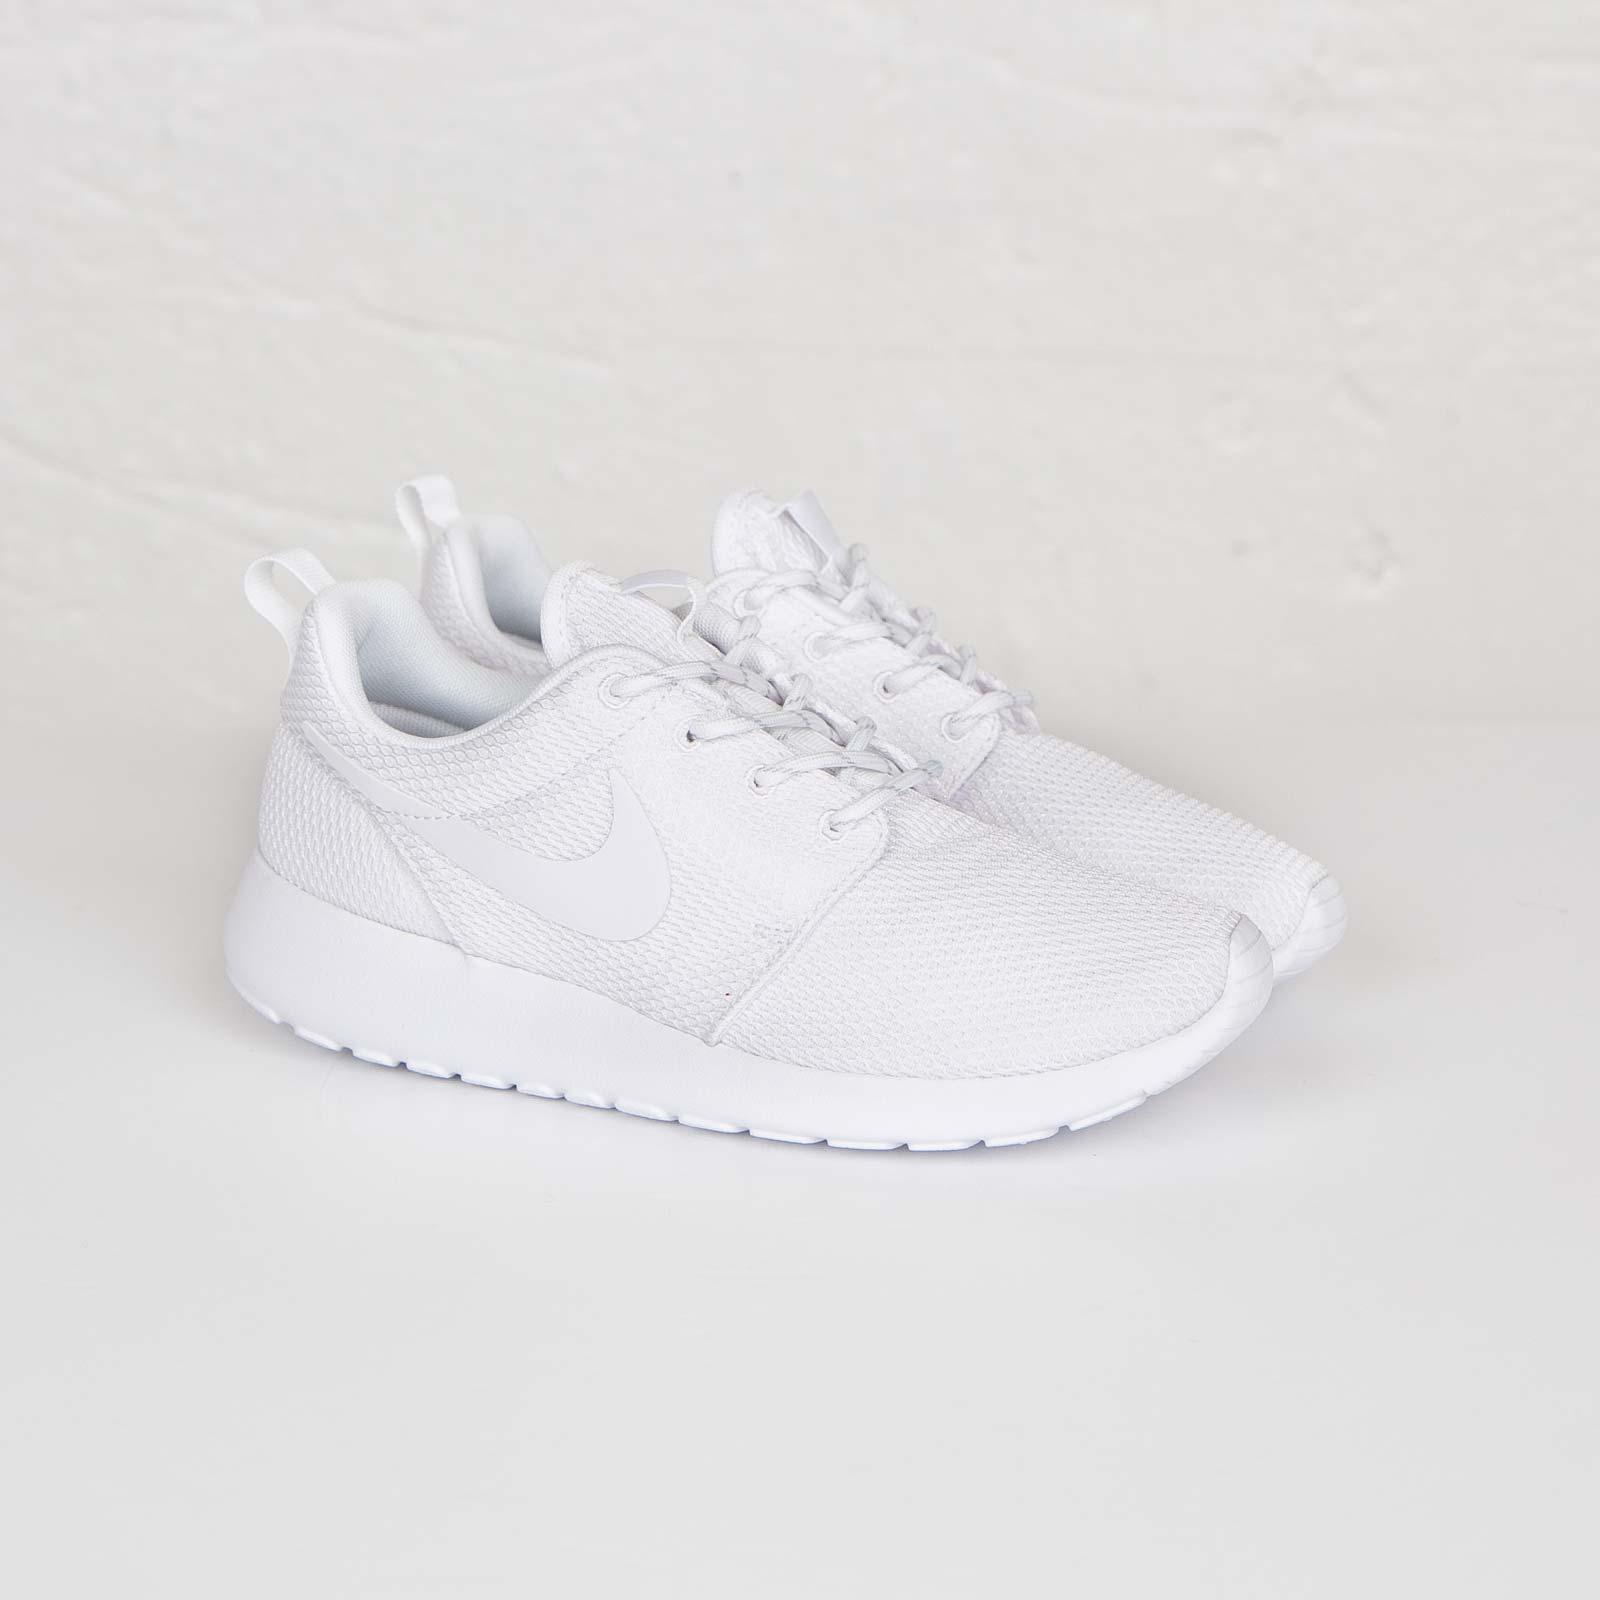 5eb7fe302ad7 Nike Wmns Roshe Run - 511882-111 - Sneakersnstuff